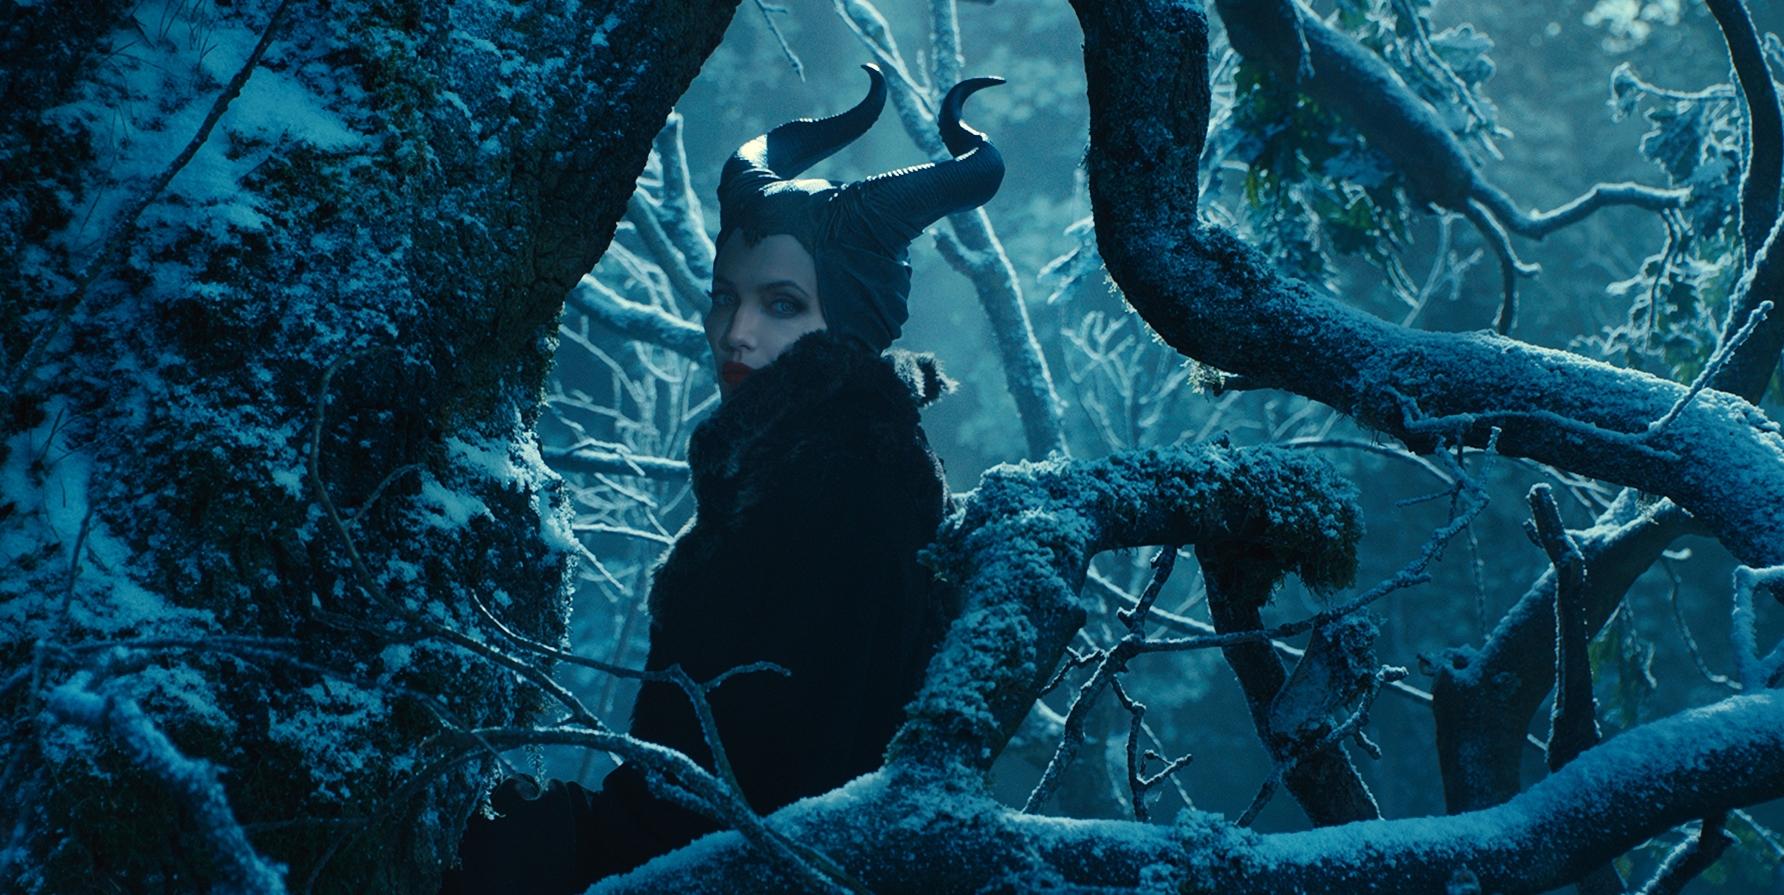 211619-Maleficent-header.jpg